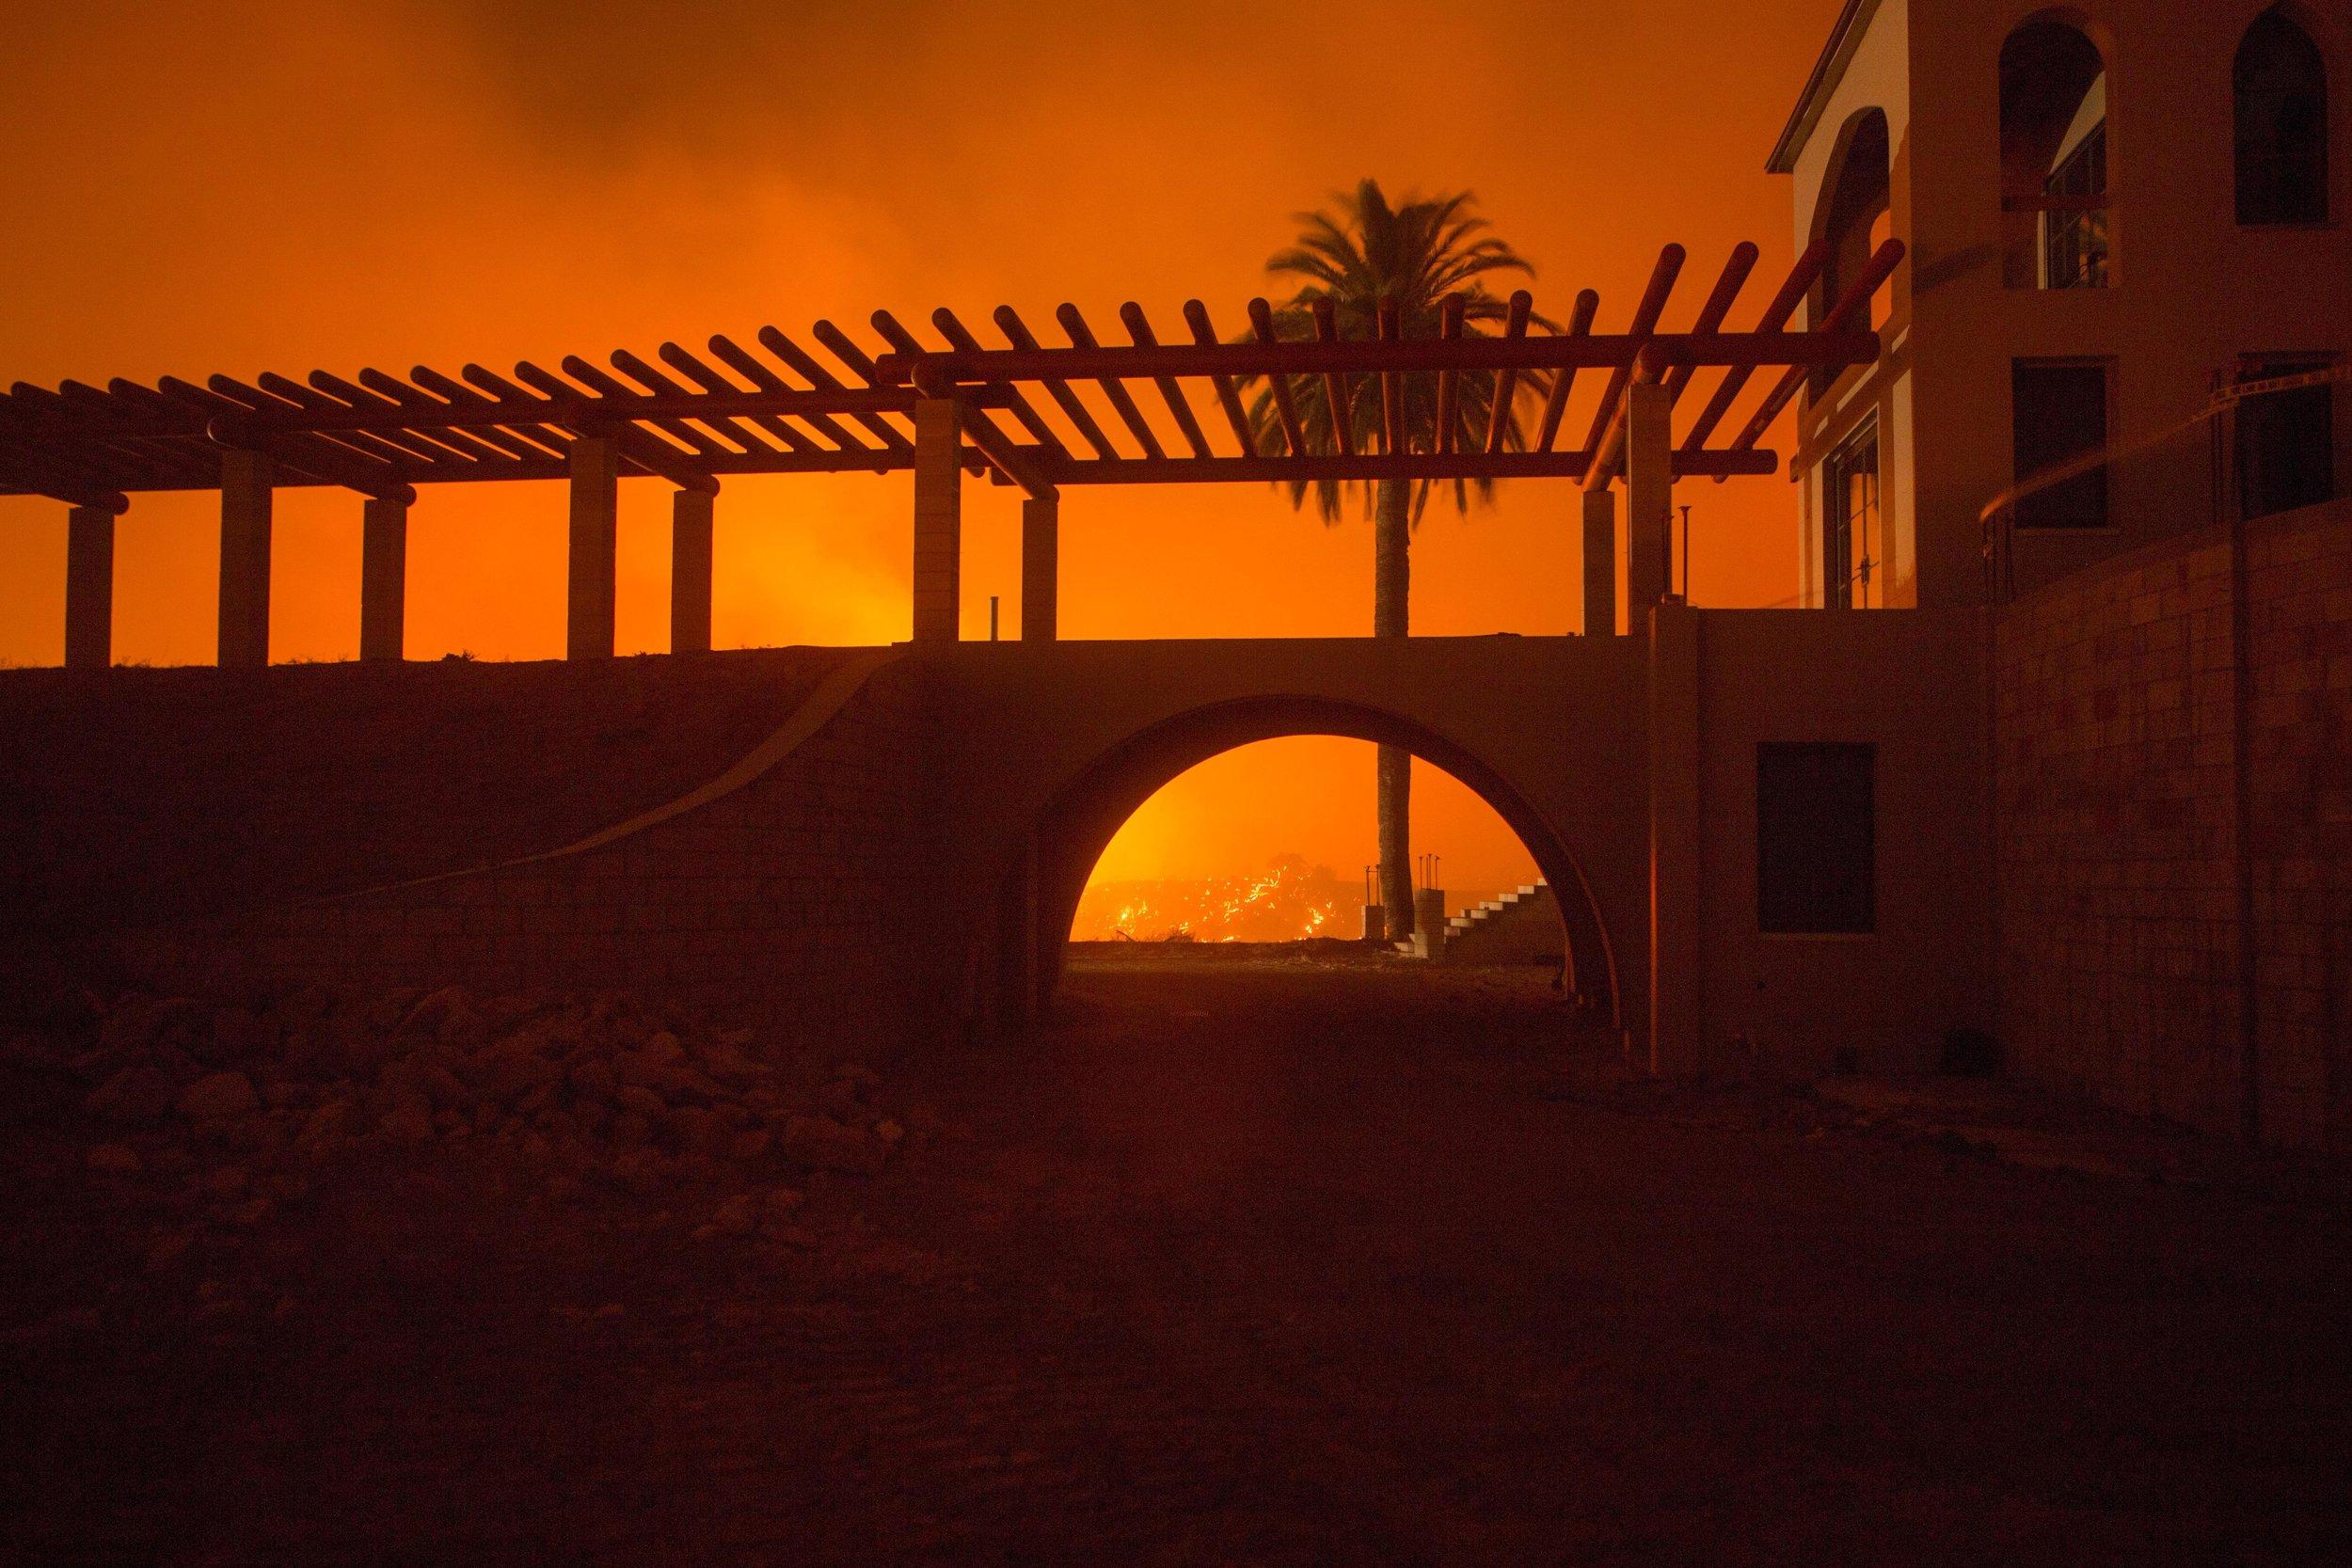 Thomas Fire Night Operations Dec. 9, 2017, California (Kari Greer, Inciweb)